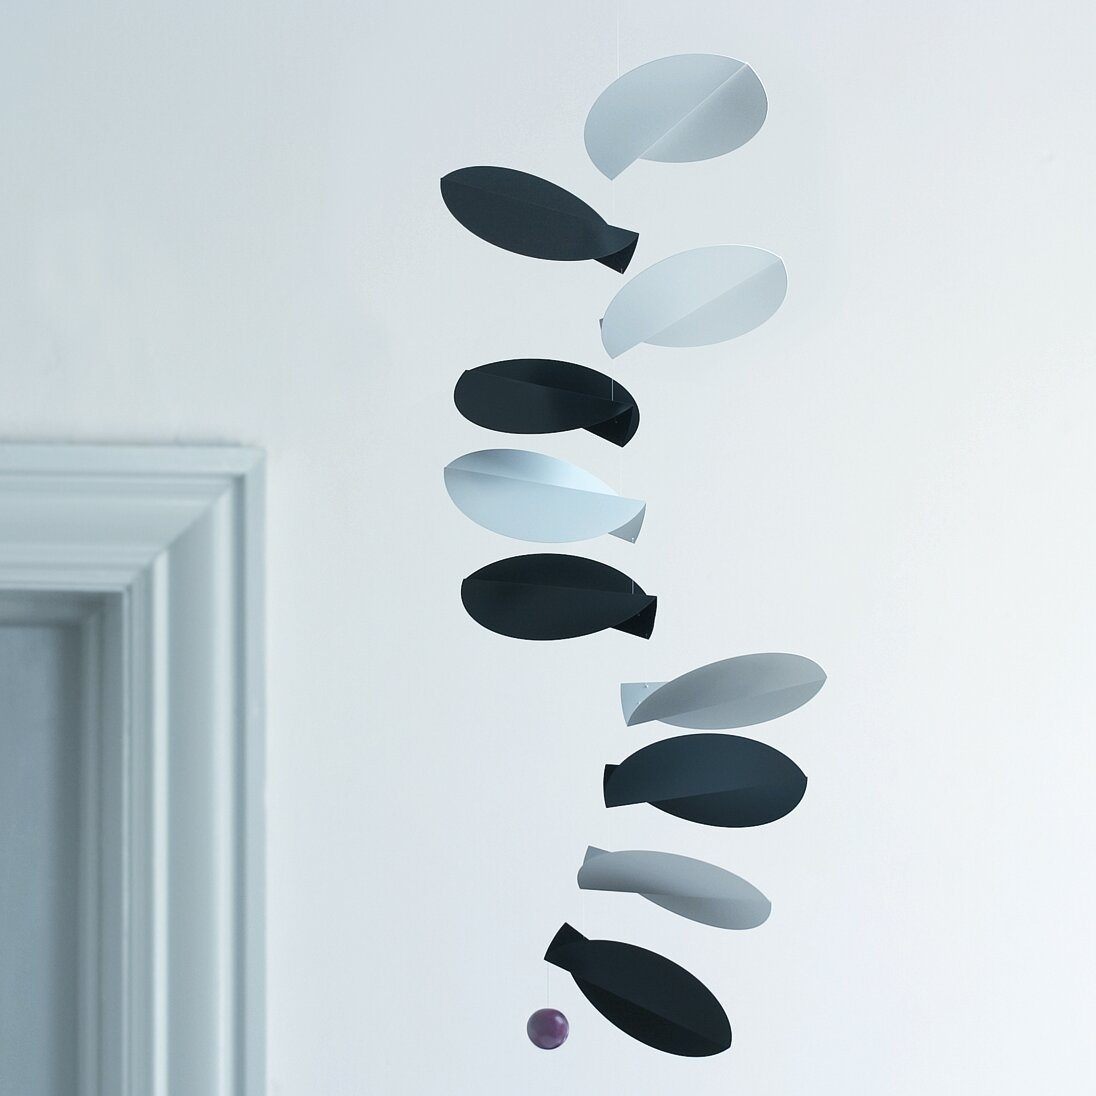 flensted mobiles abstract turning leaves mobile reviews. Black Bedroom Furniture Sets. Home Design Ideas